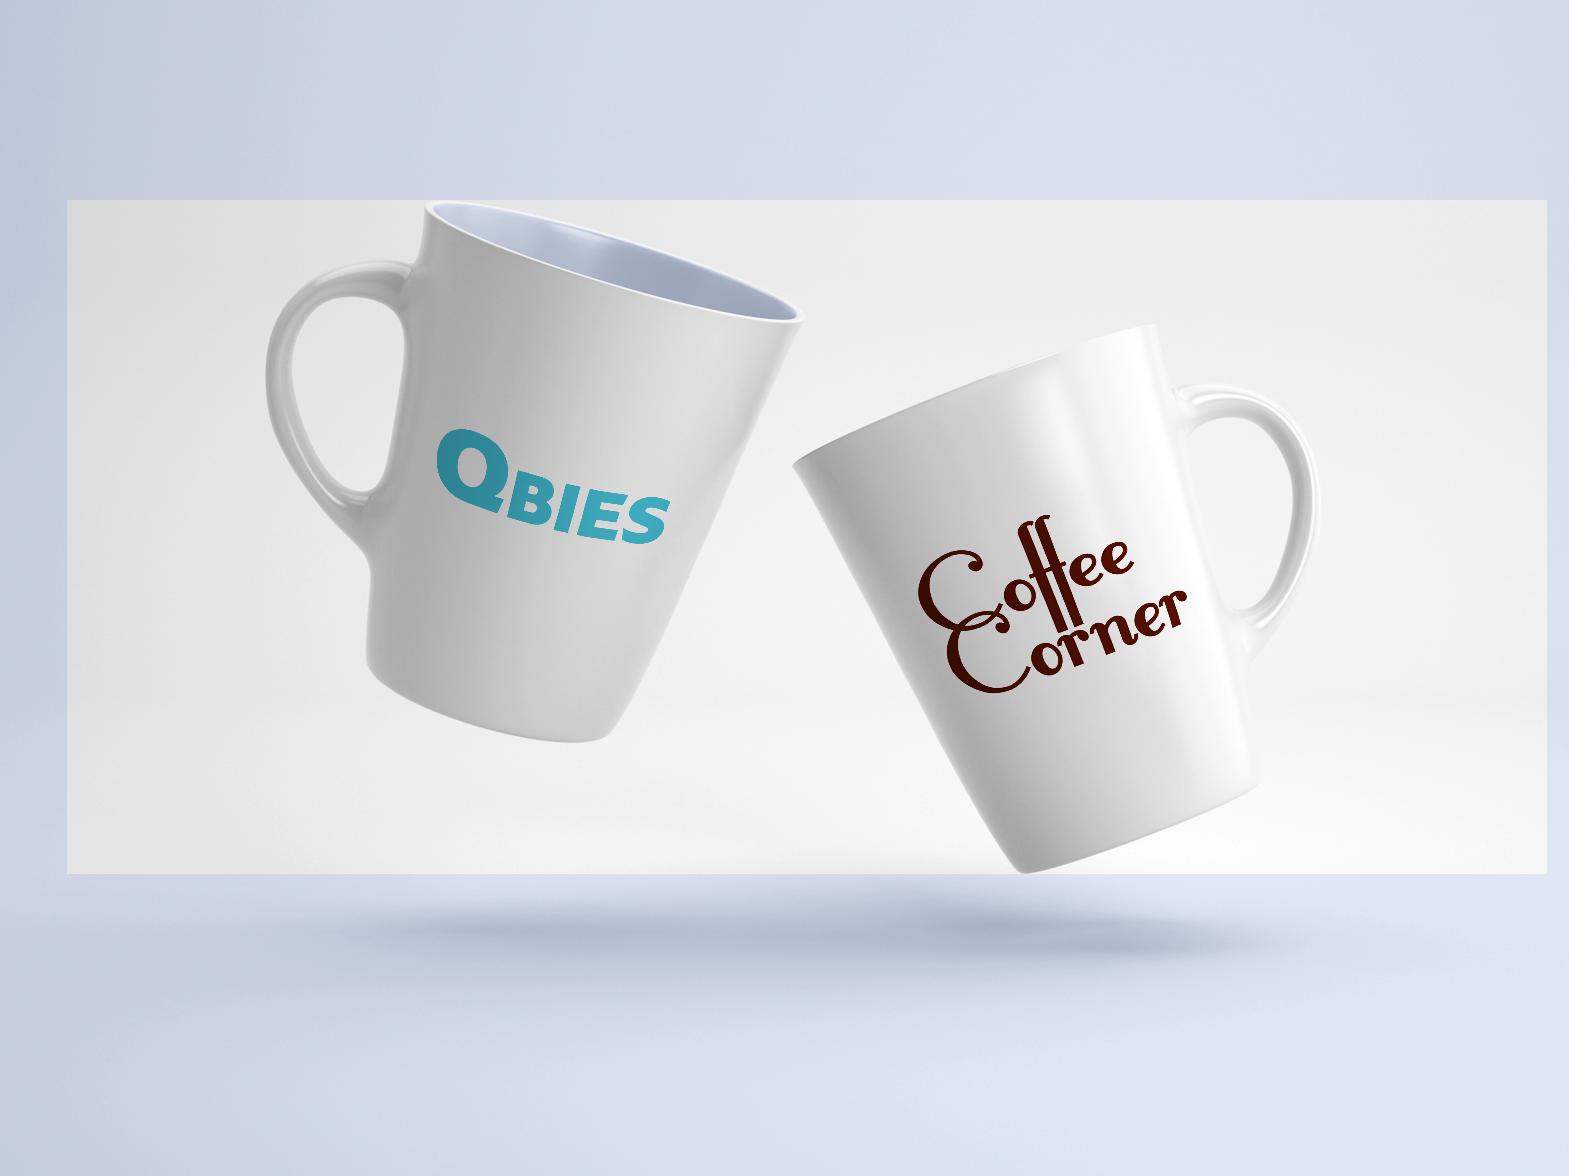 Qbies Coffee Corner